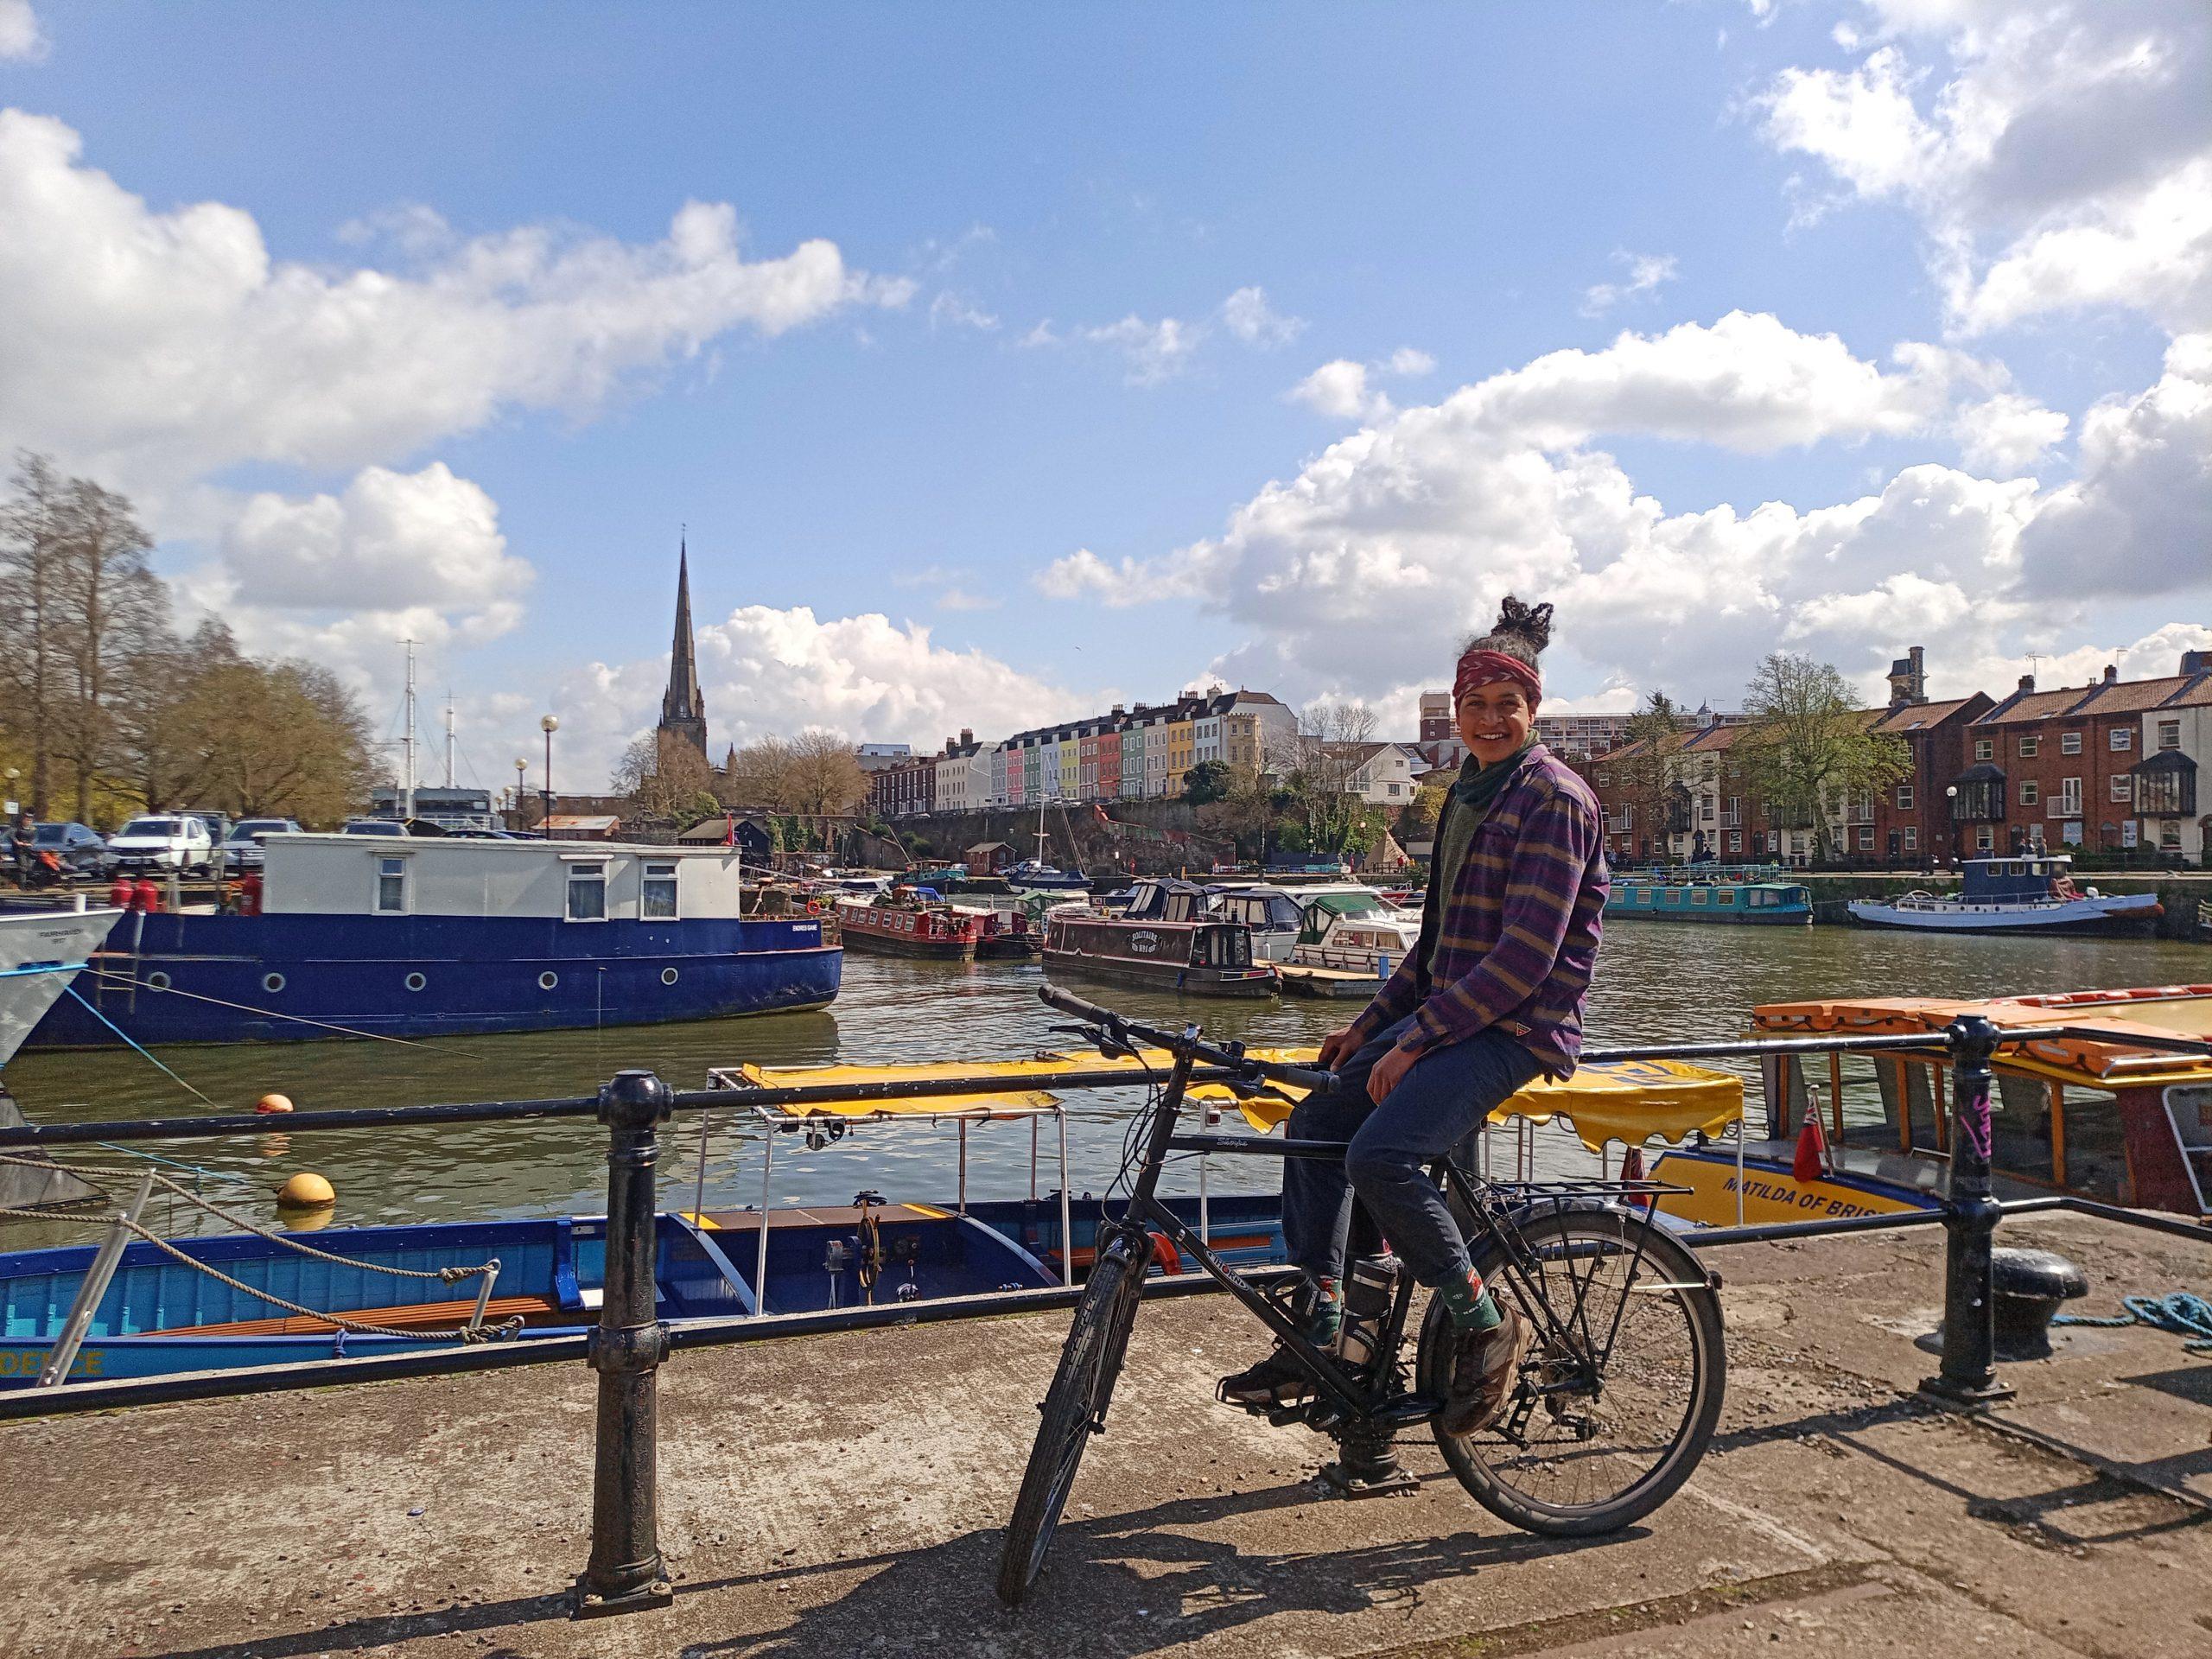 Bicycle Mayor Leahh DeHaan